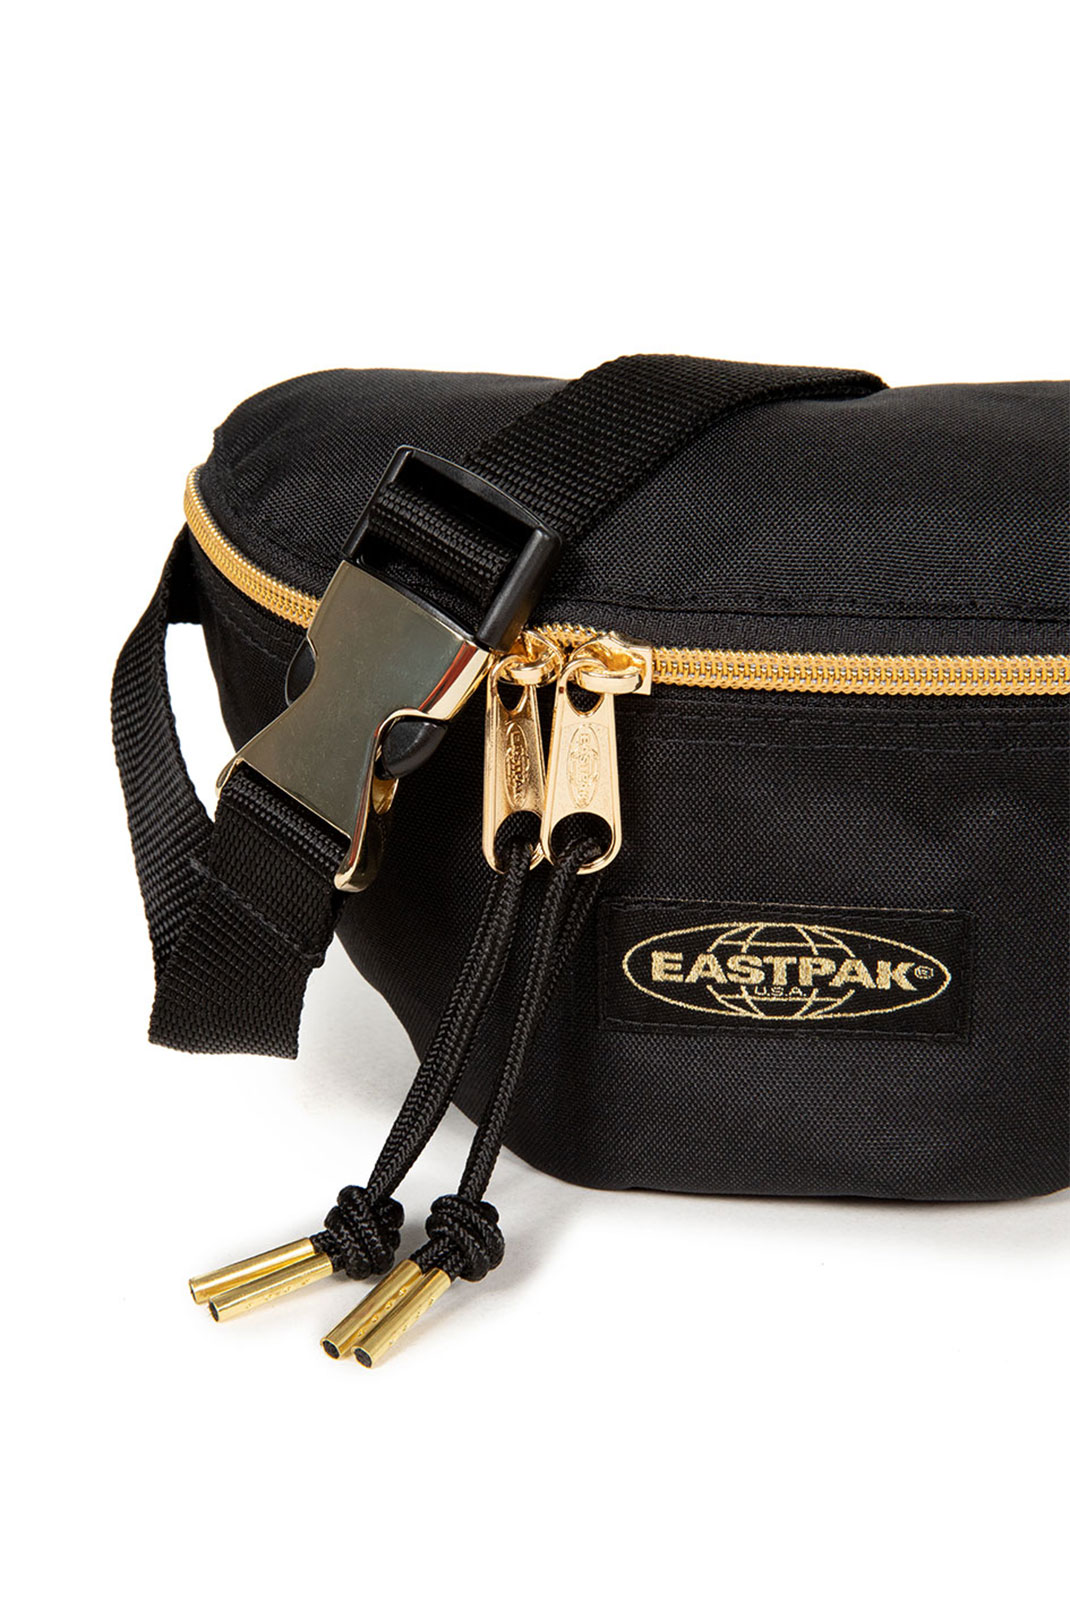 Sac porté épaule  Eastpak EK07430Z SPRINGER multi noir